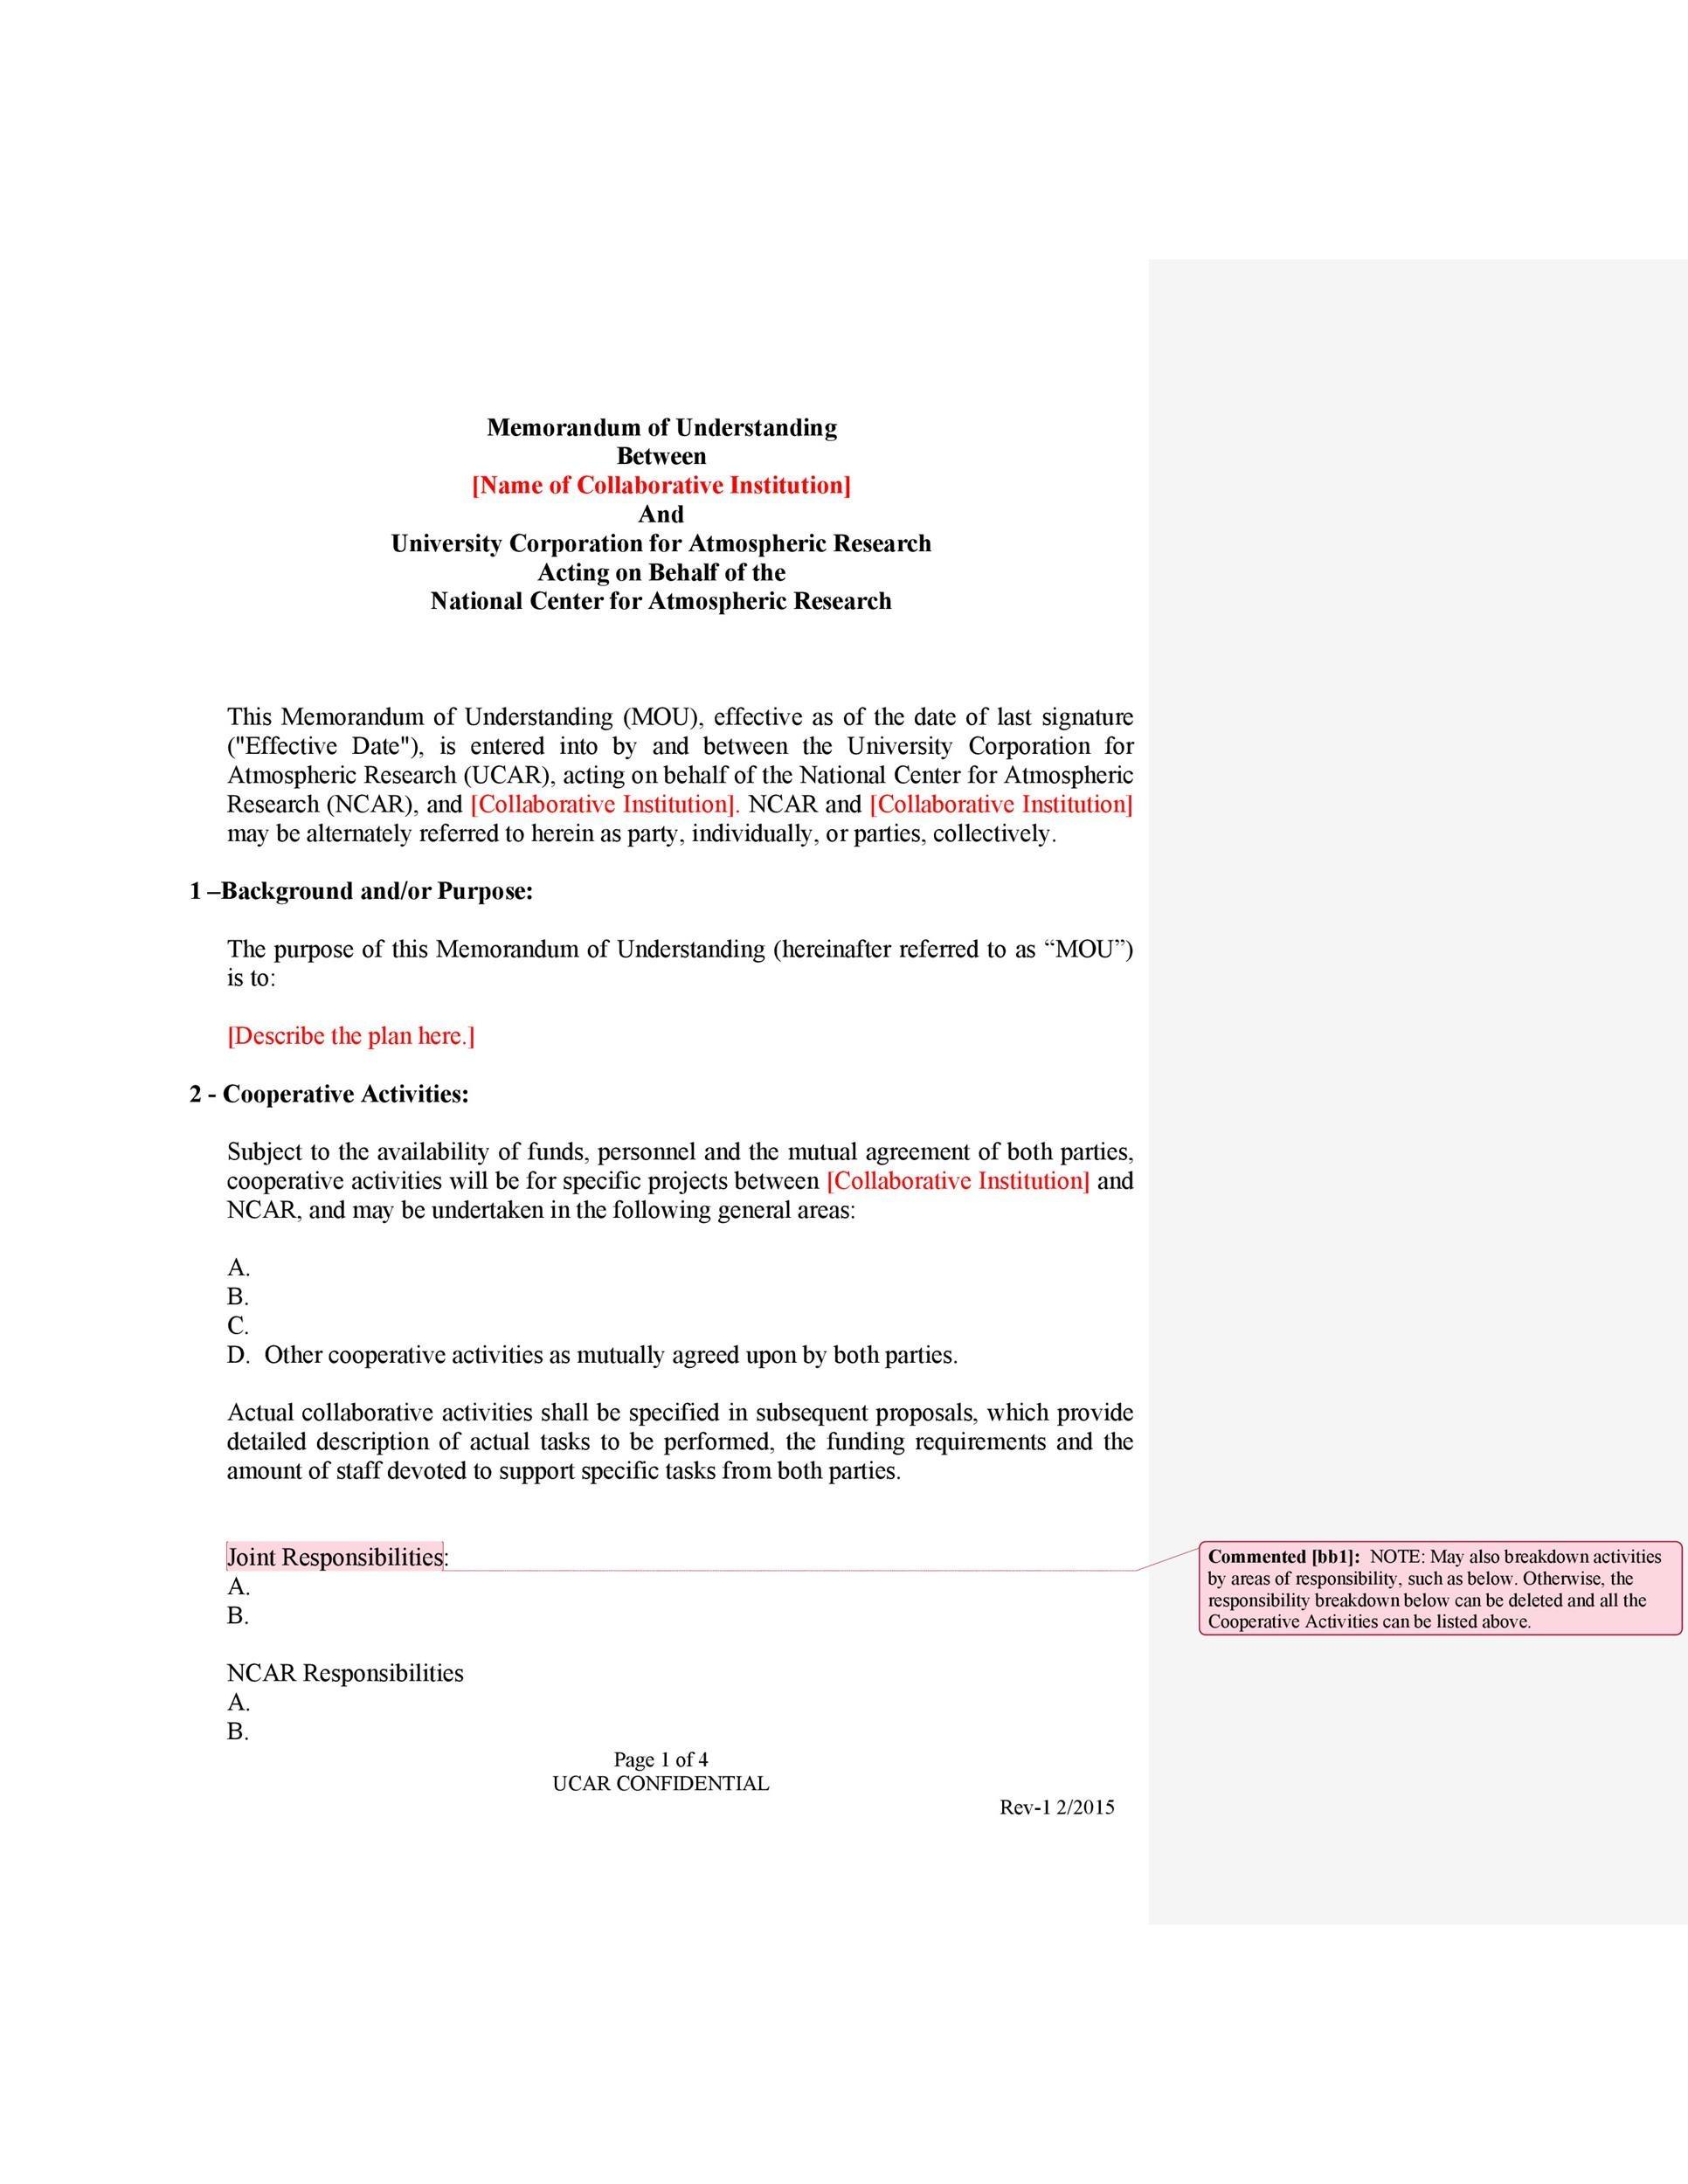 Free Memorandum of Understanding Template 25